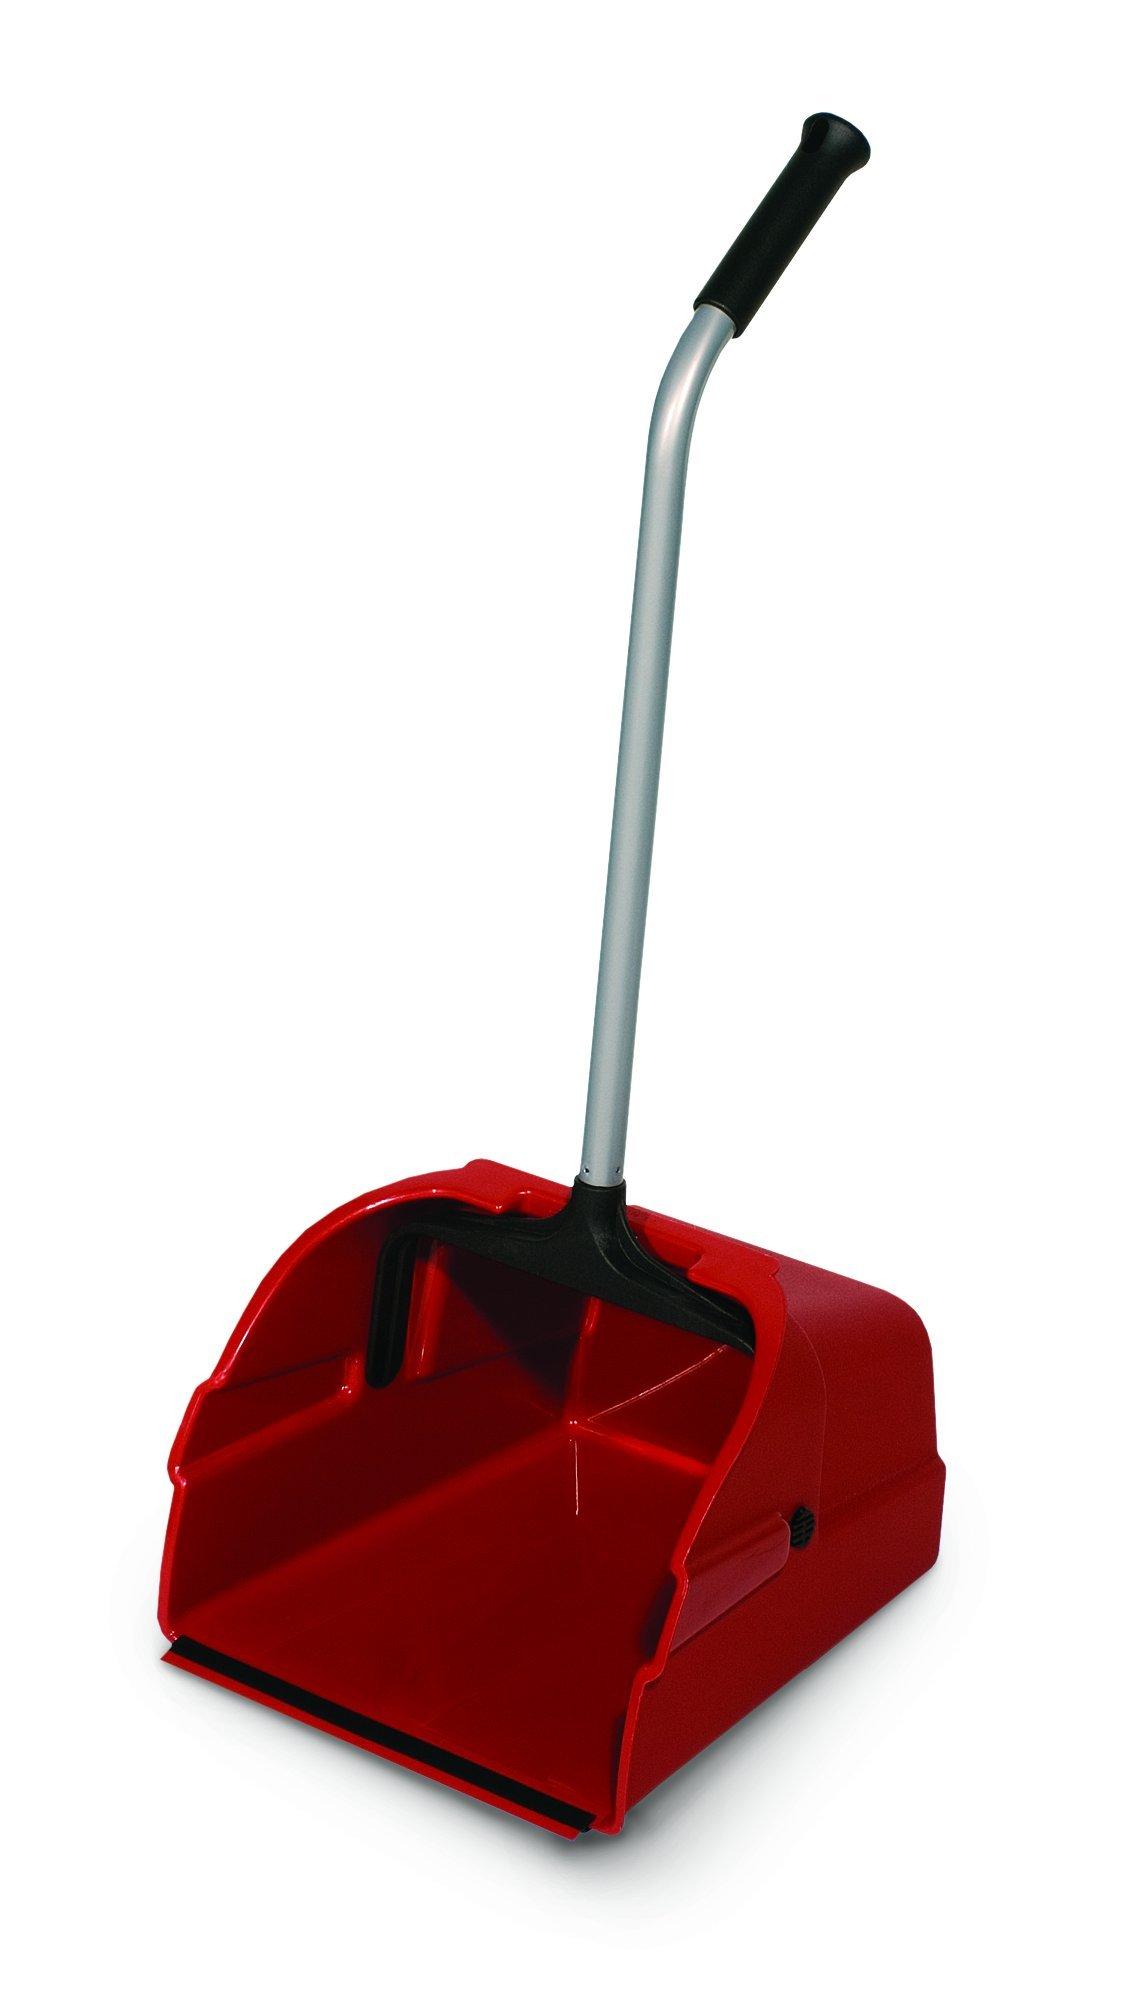 Delamo 8497-6 Jumbo Debris Lobby Pan, Red (Pack of 6)